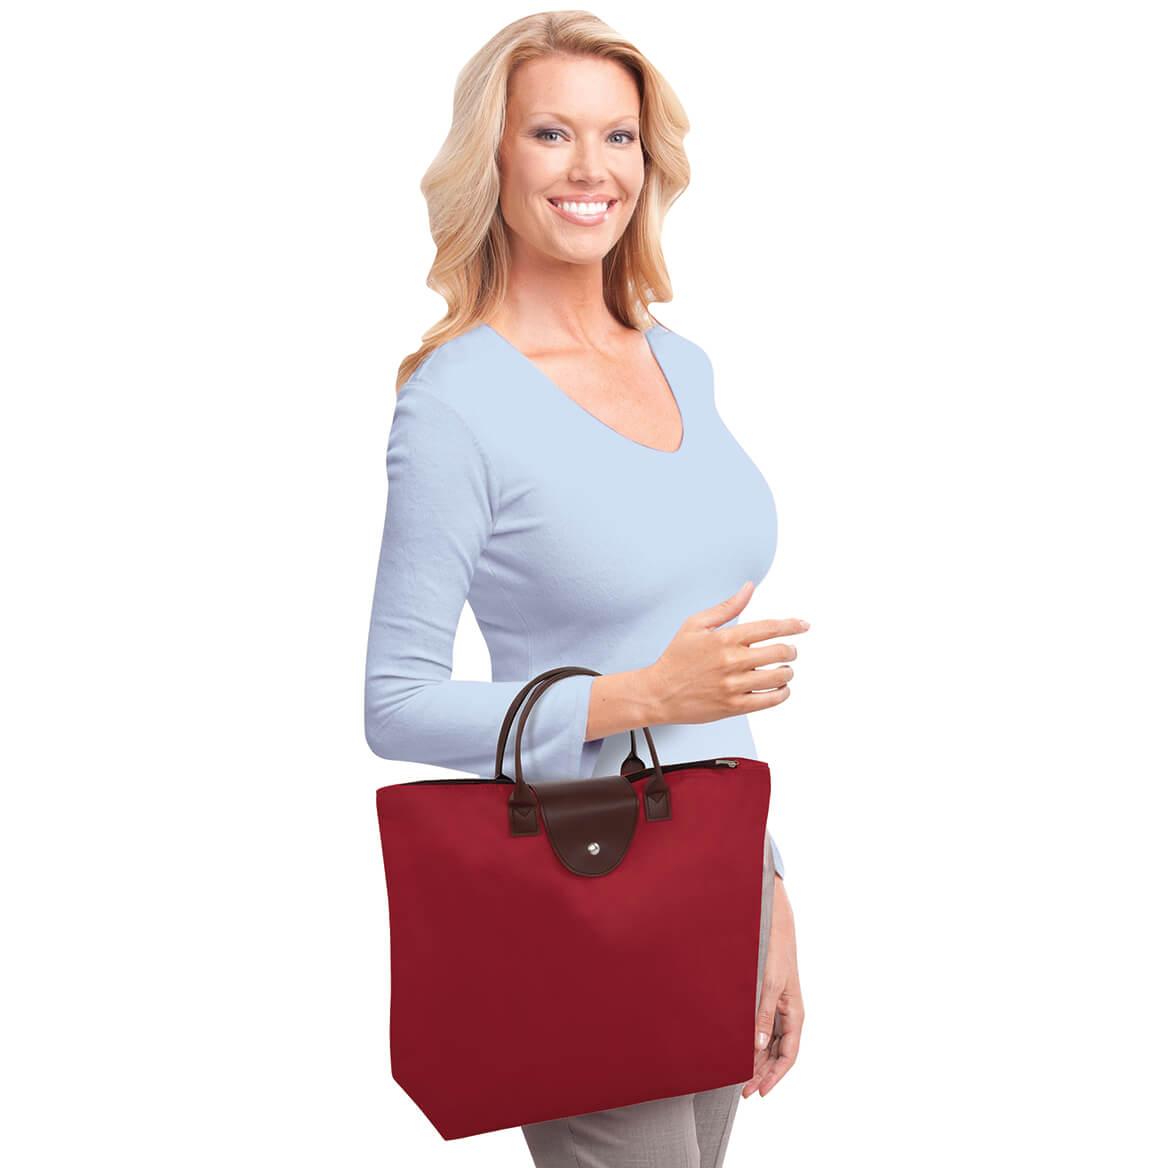 Catherine Kelly Fold & Go Tote Bag-369971